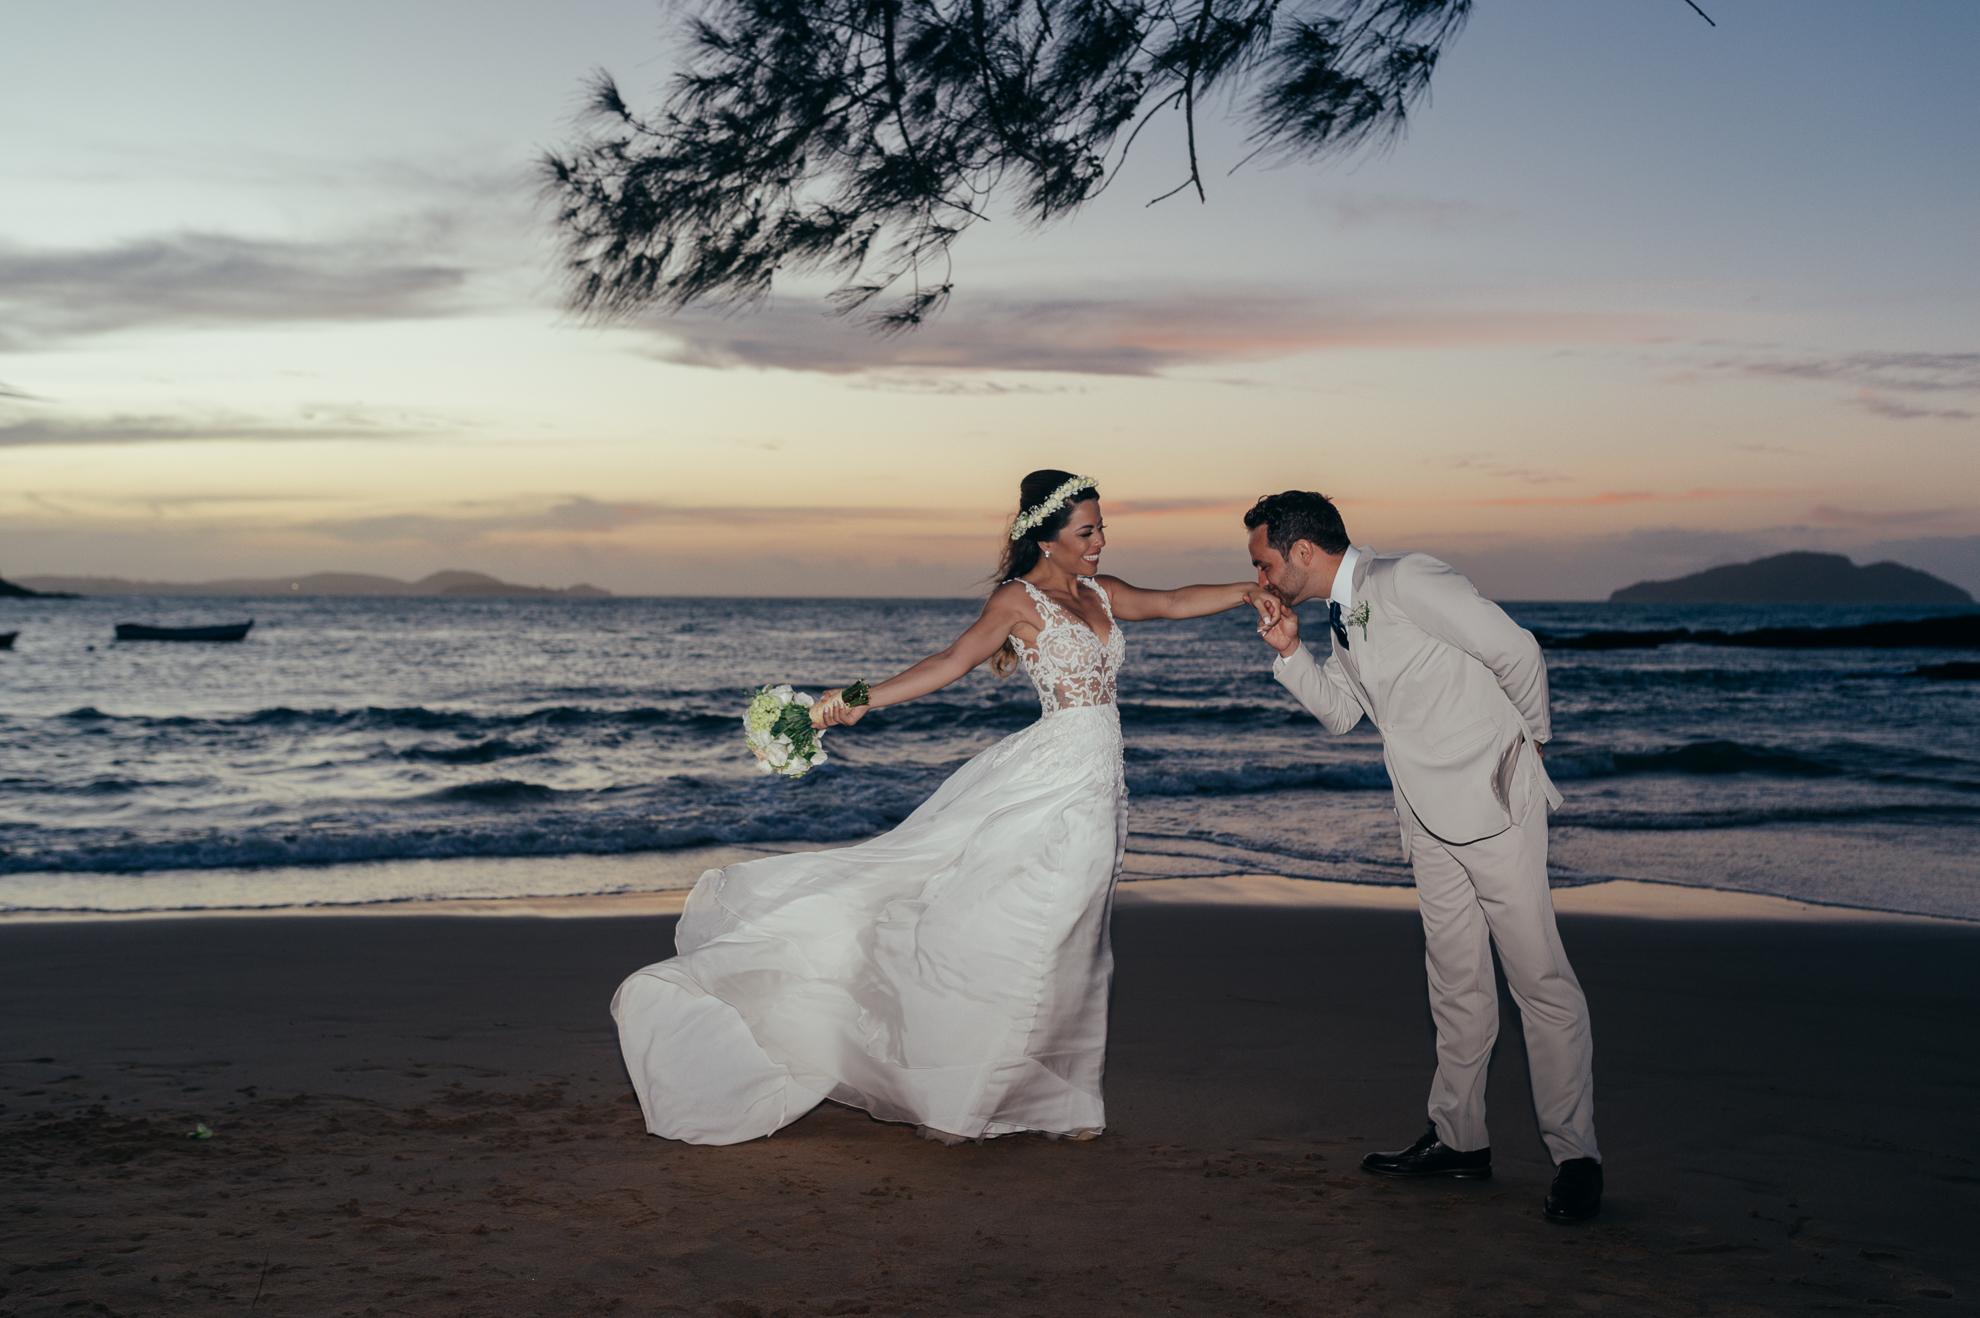 Pousada Praia da Tartaruga - Priscila & Guilherme (85)